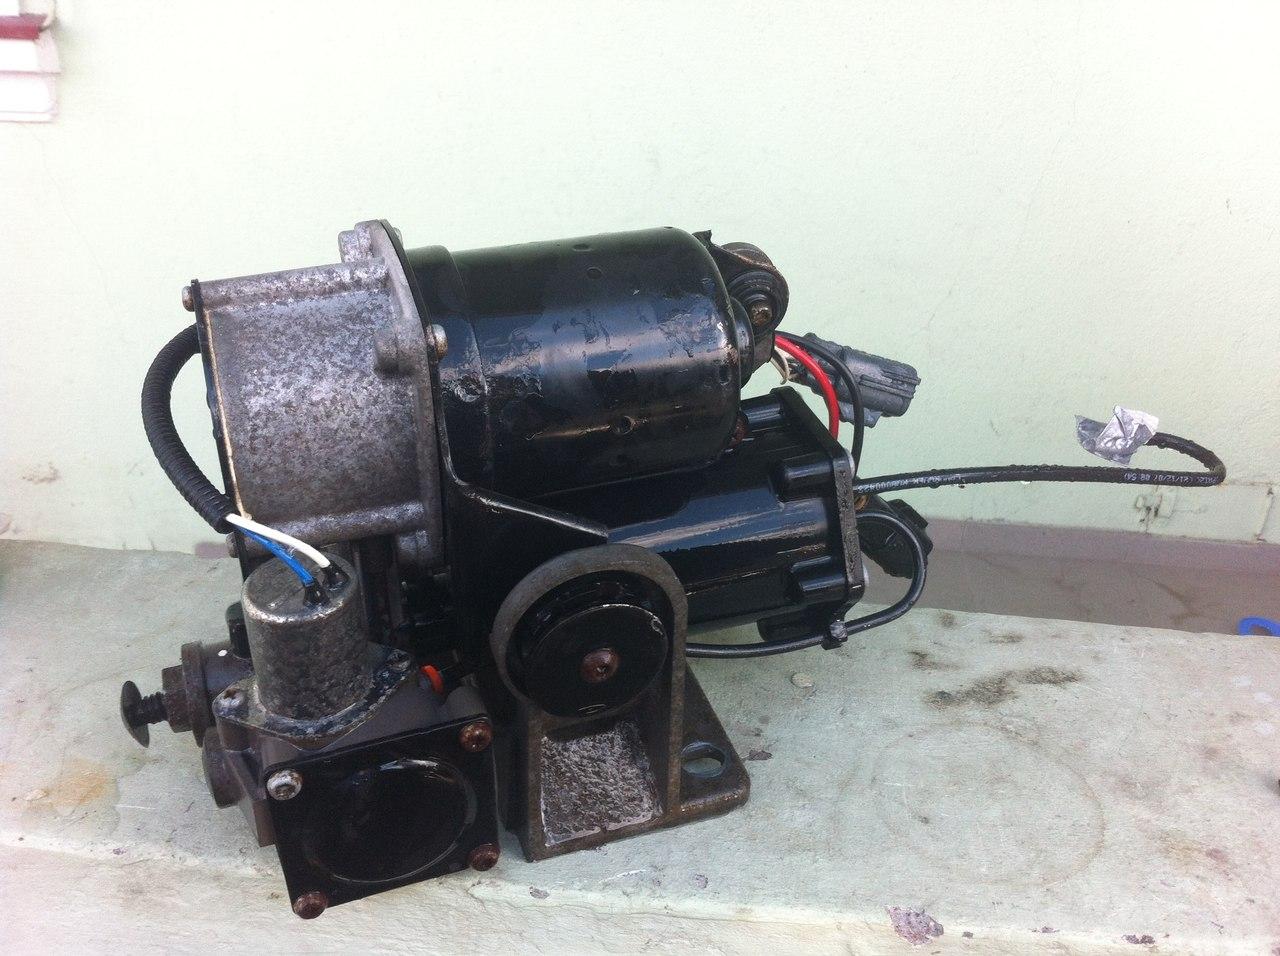 Ремонт компрессора пневмоподвески дискавери 3 своими руками